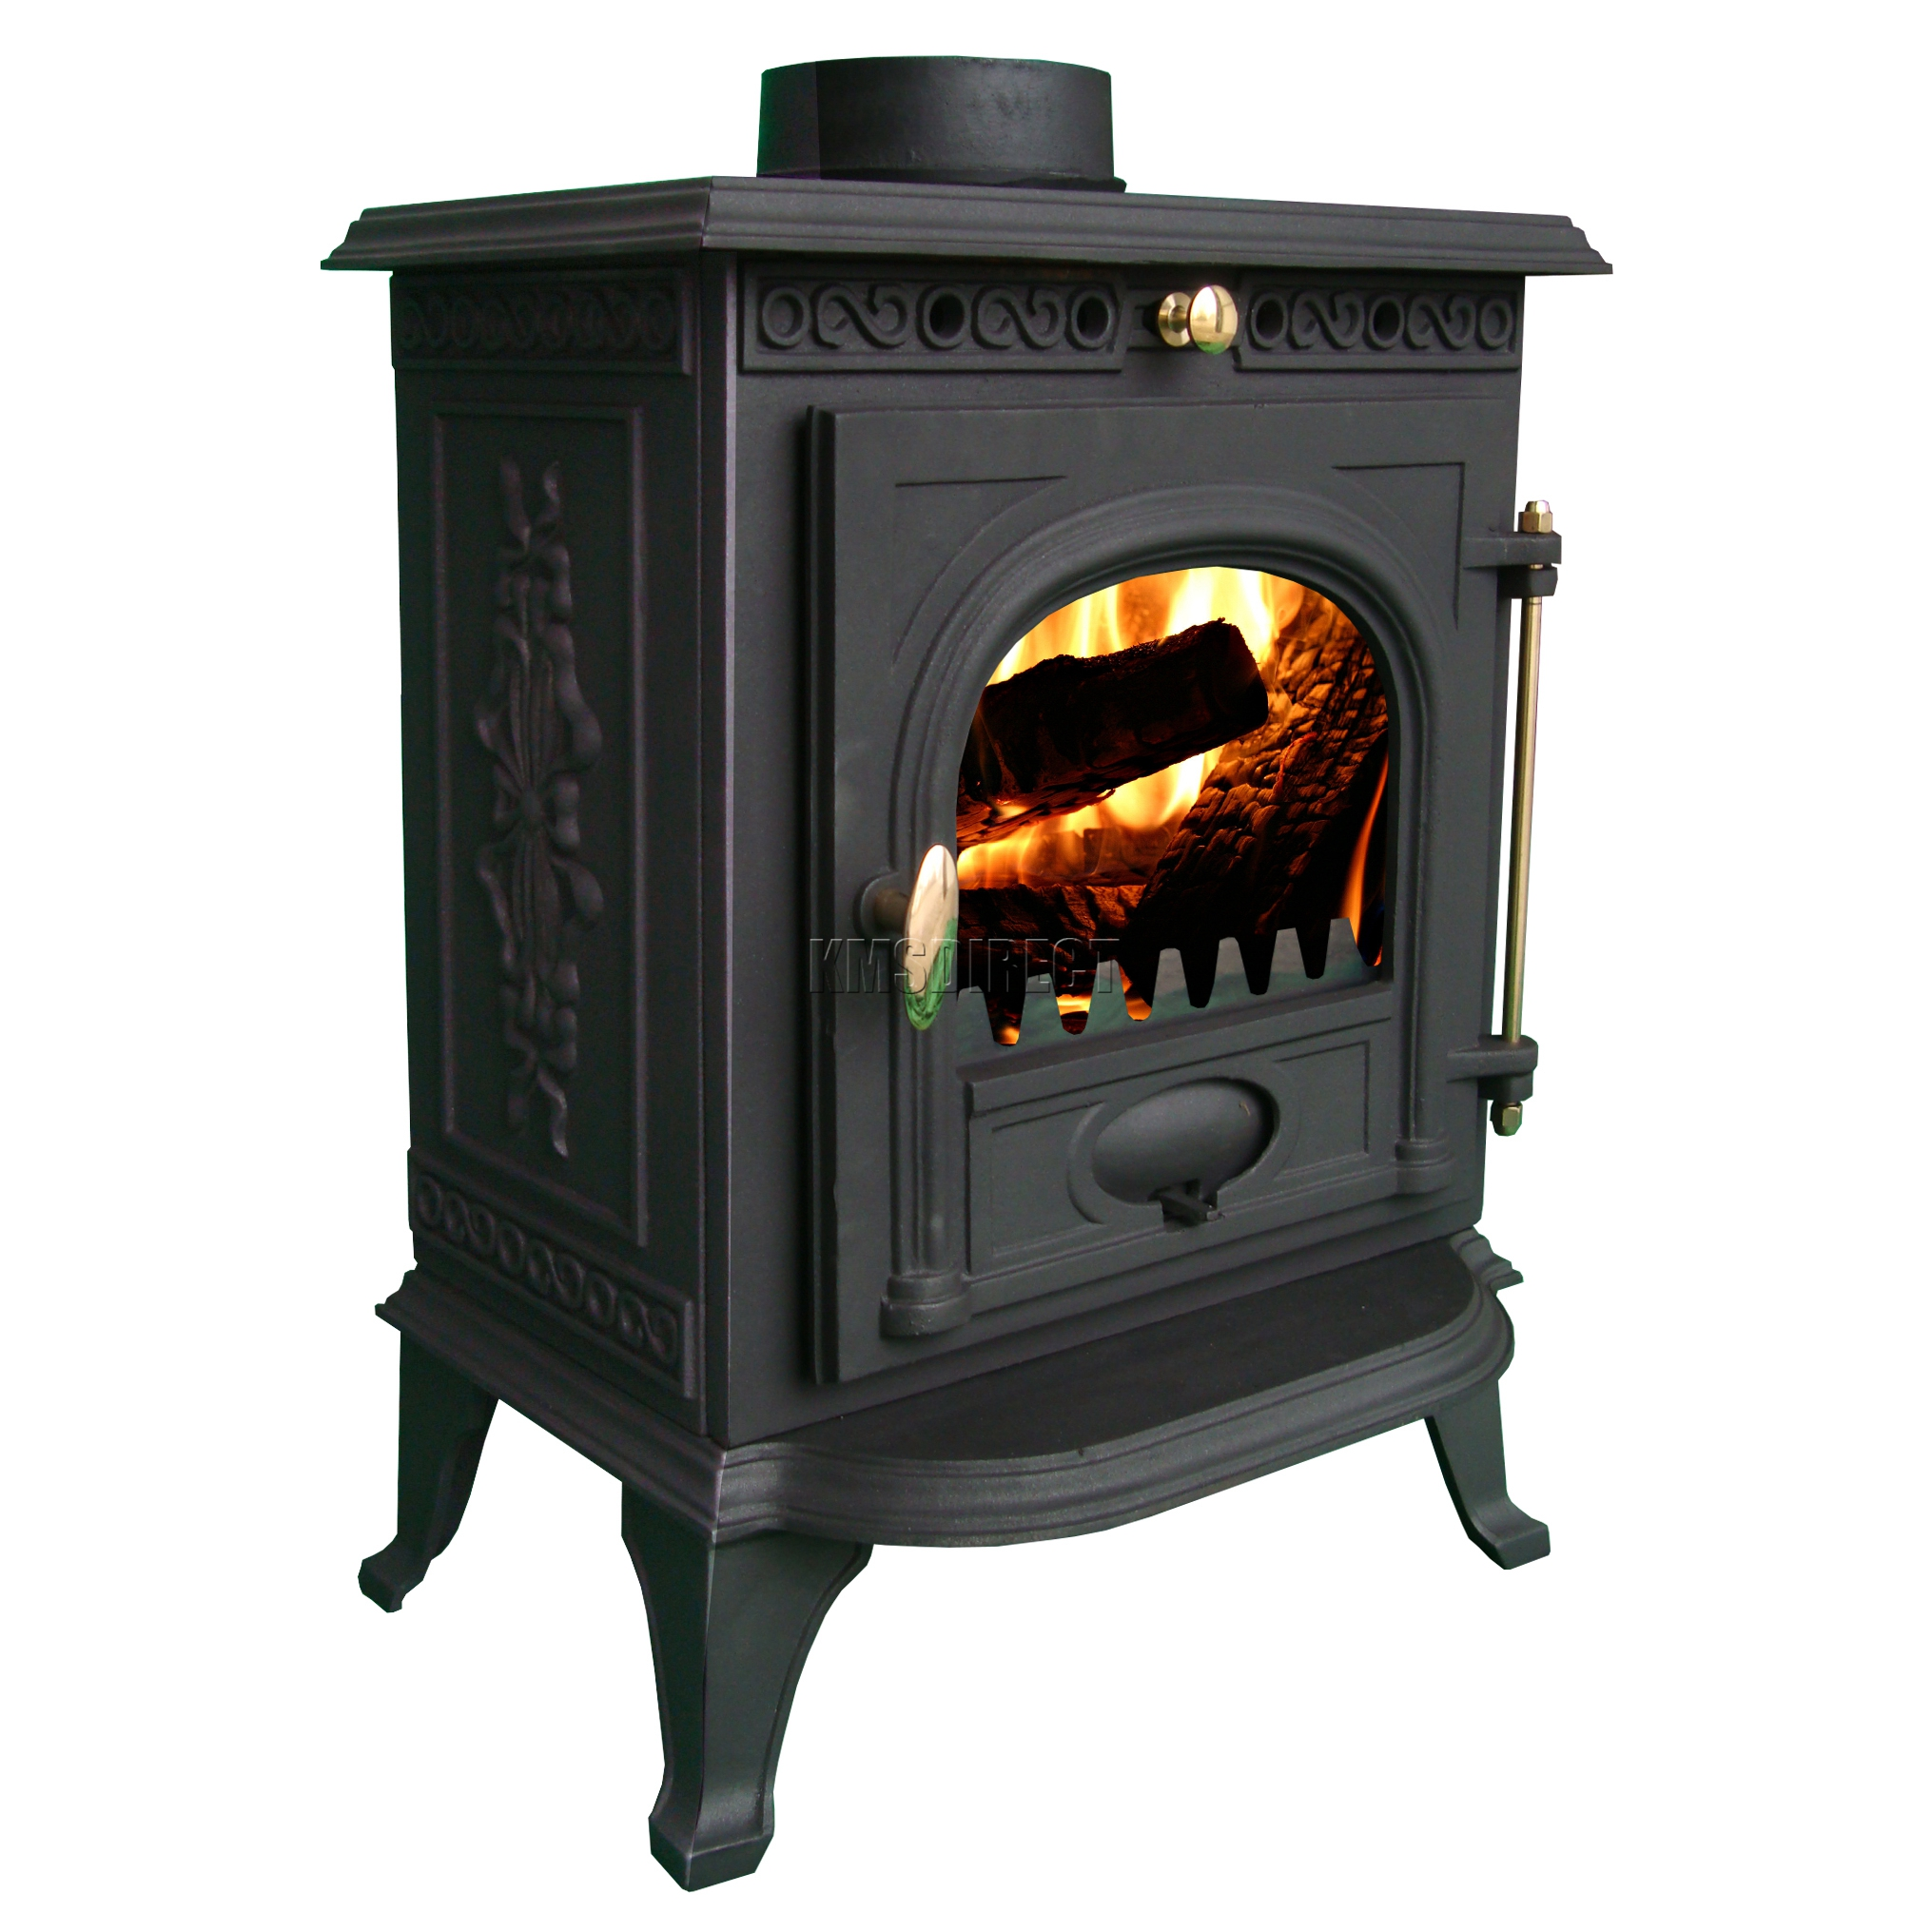 6kw Ja014 High Efficient Cast Iron Log Burner Multifuel